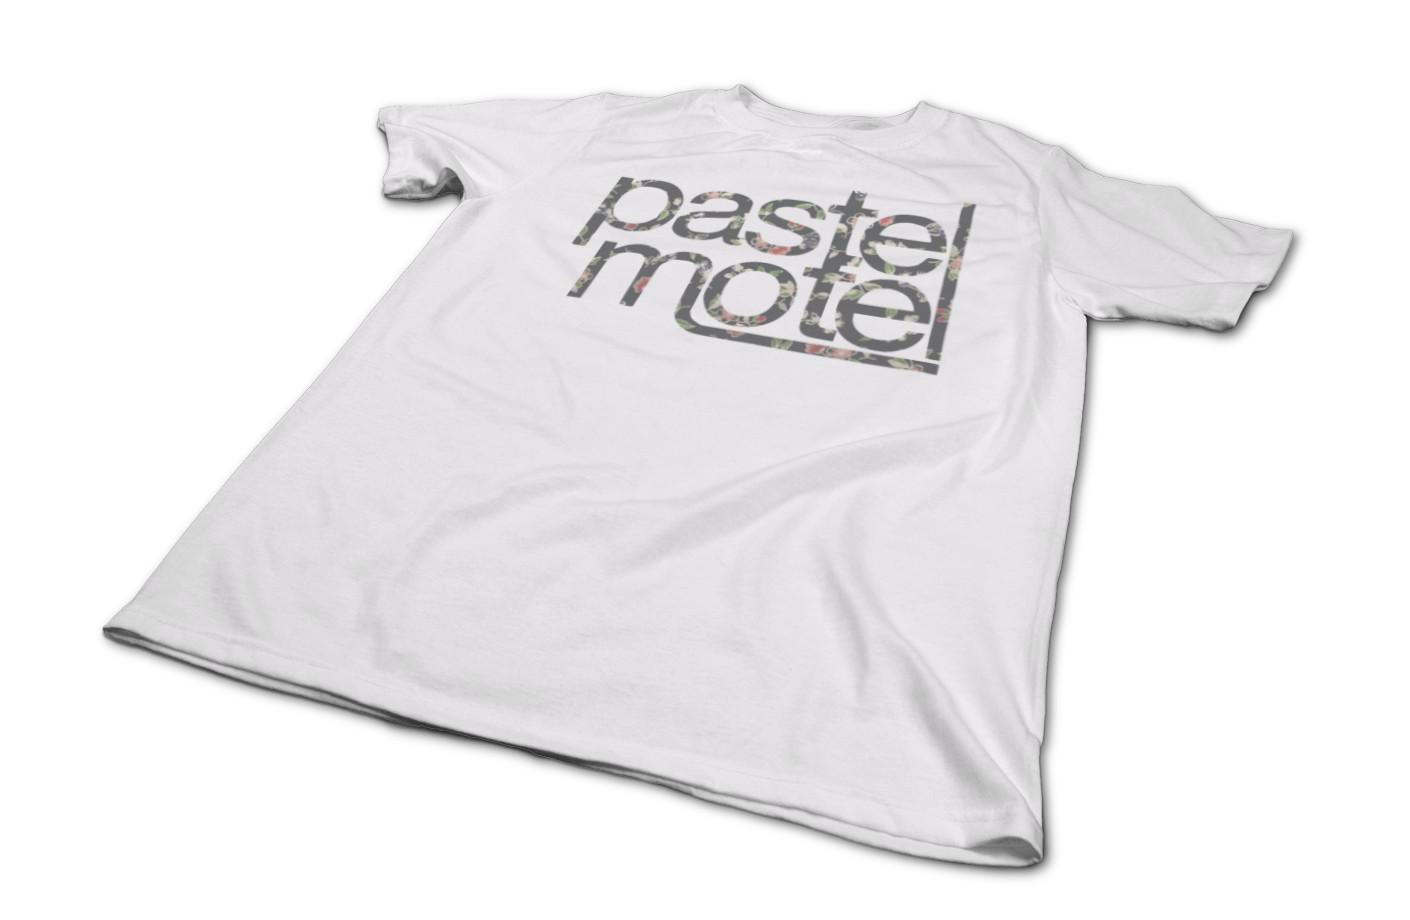 Pastel motel flower logo 1516317388